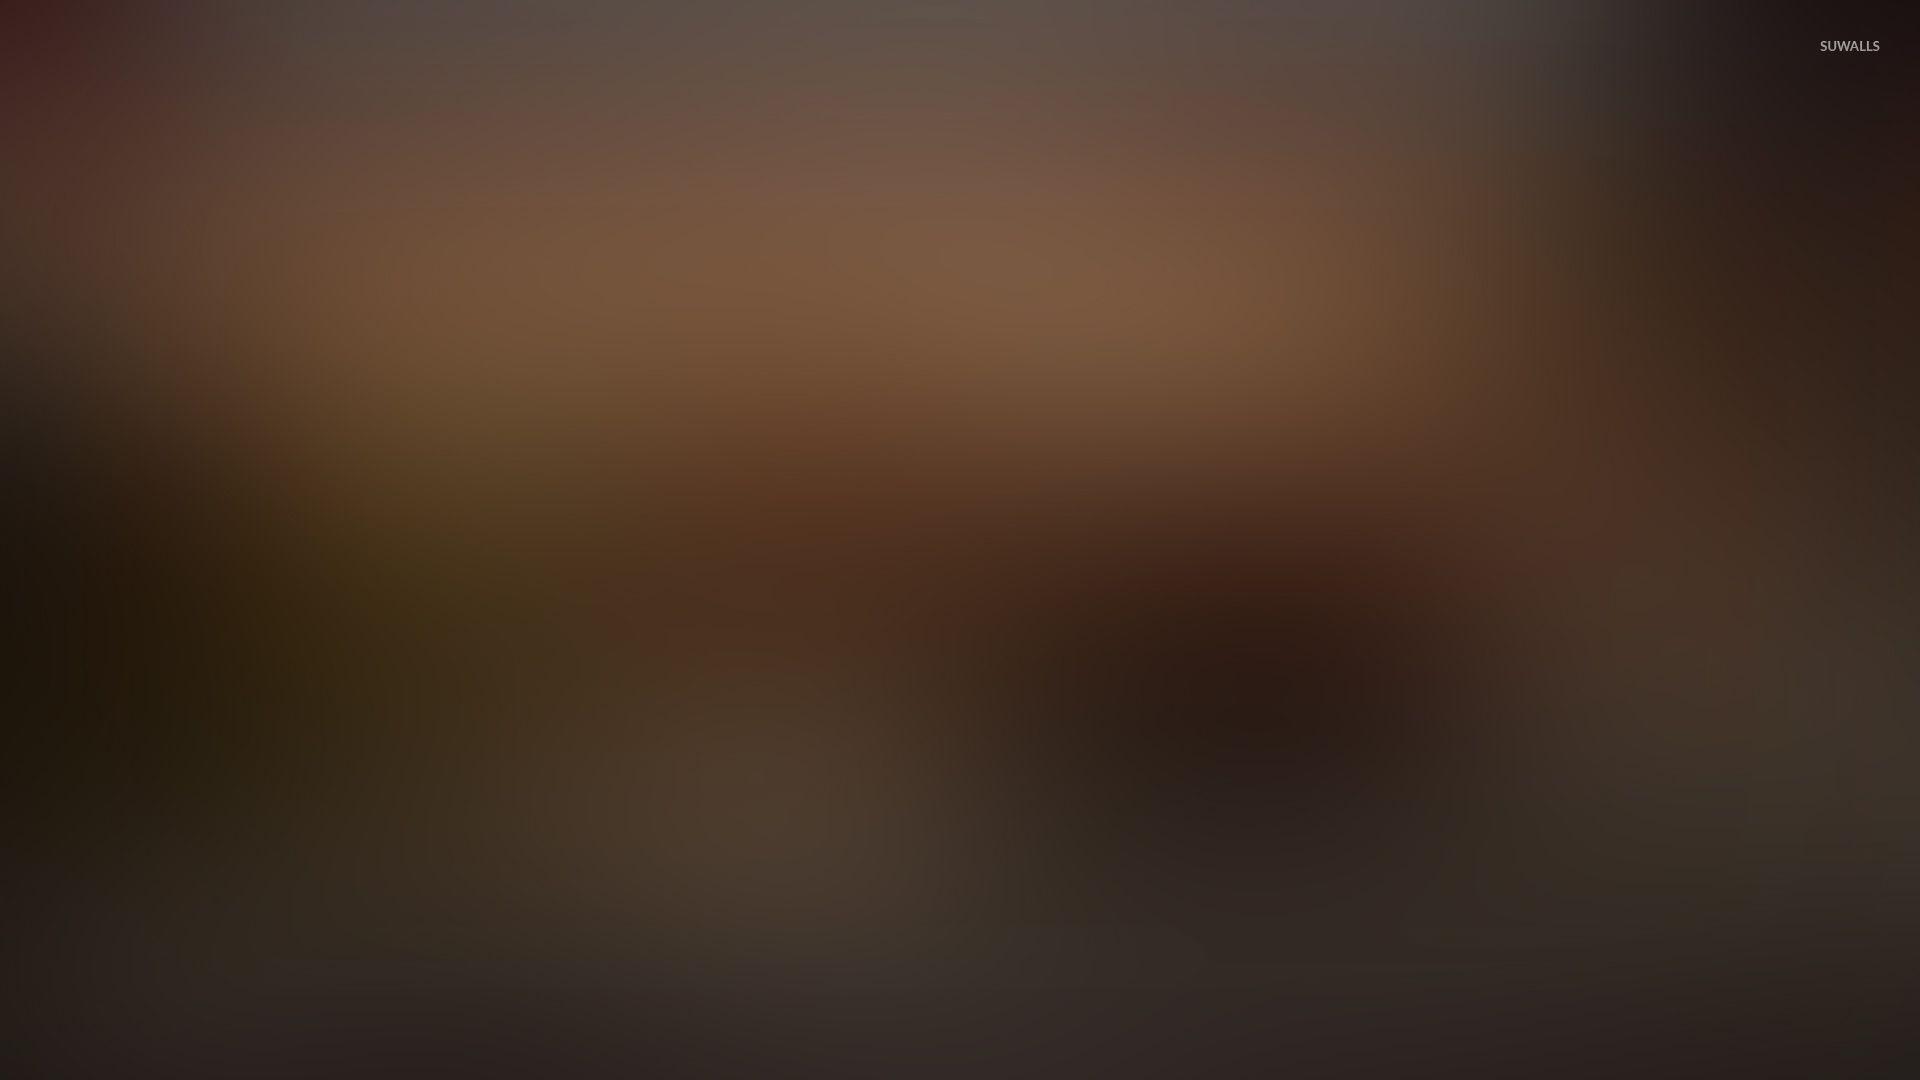 Brown blur wallpaper jpg